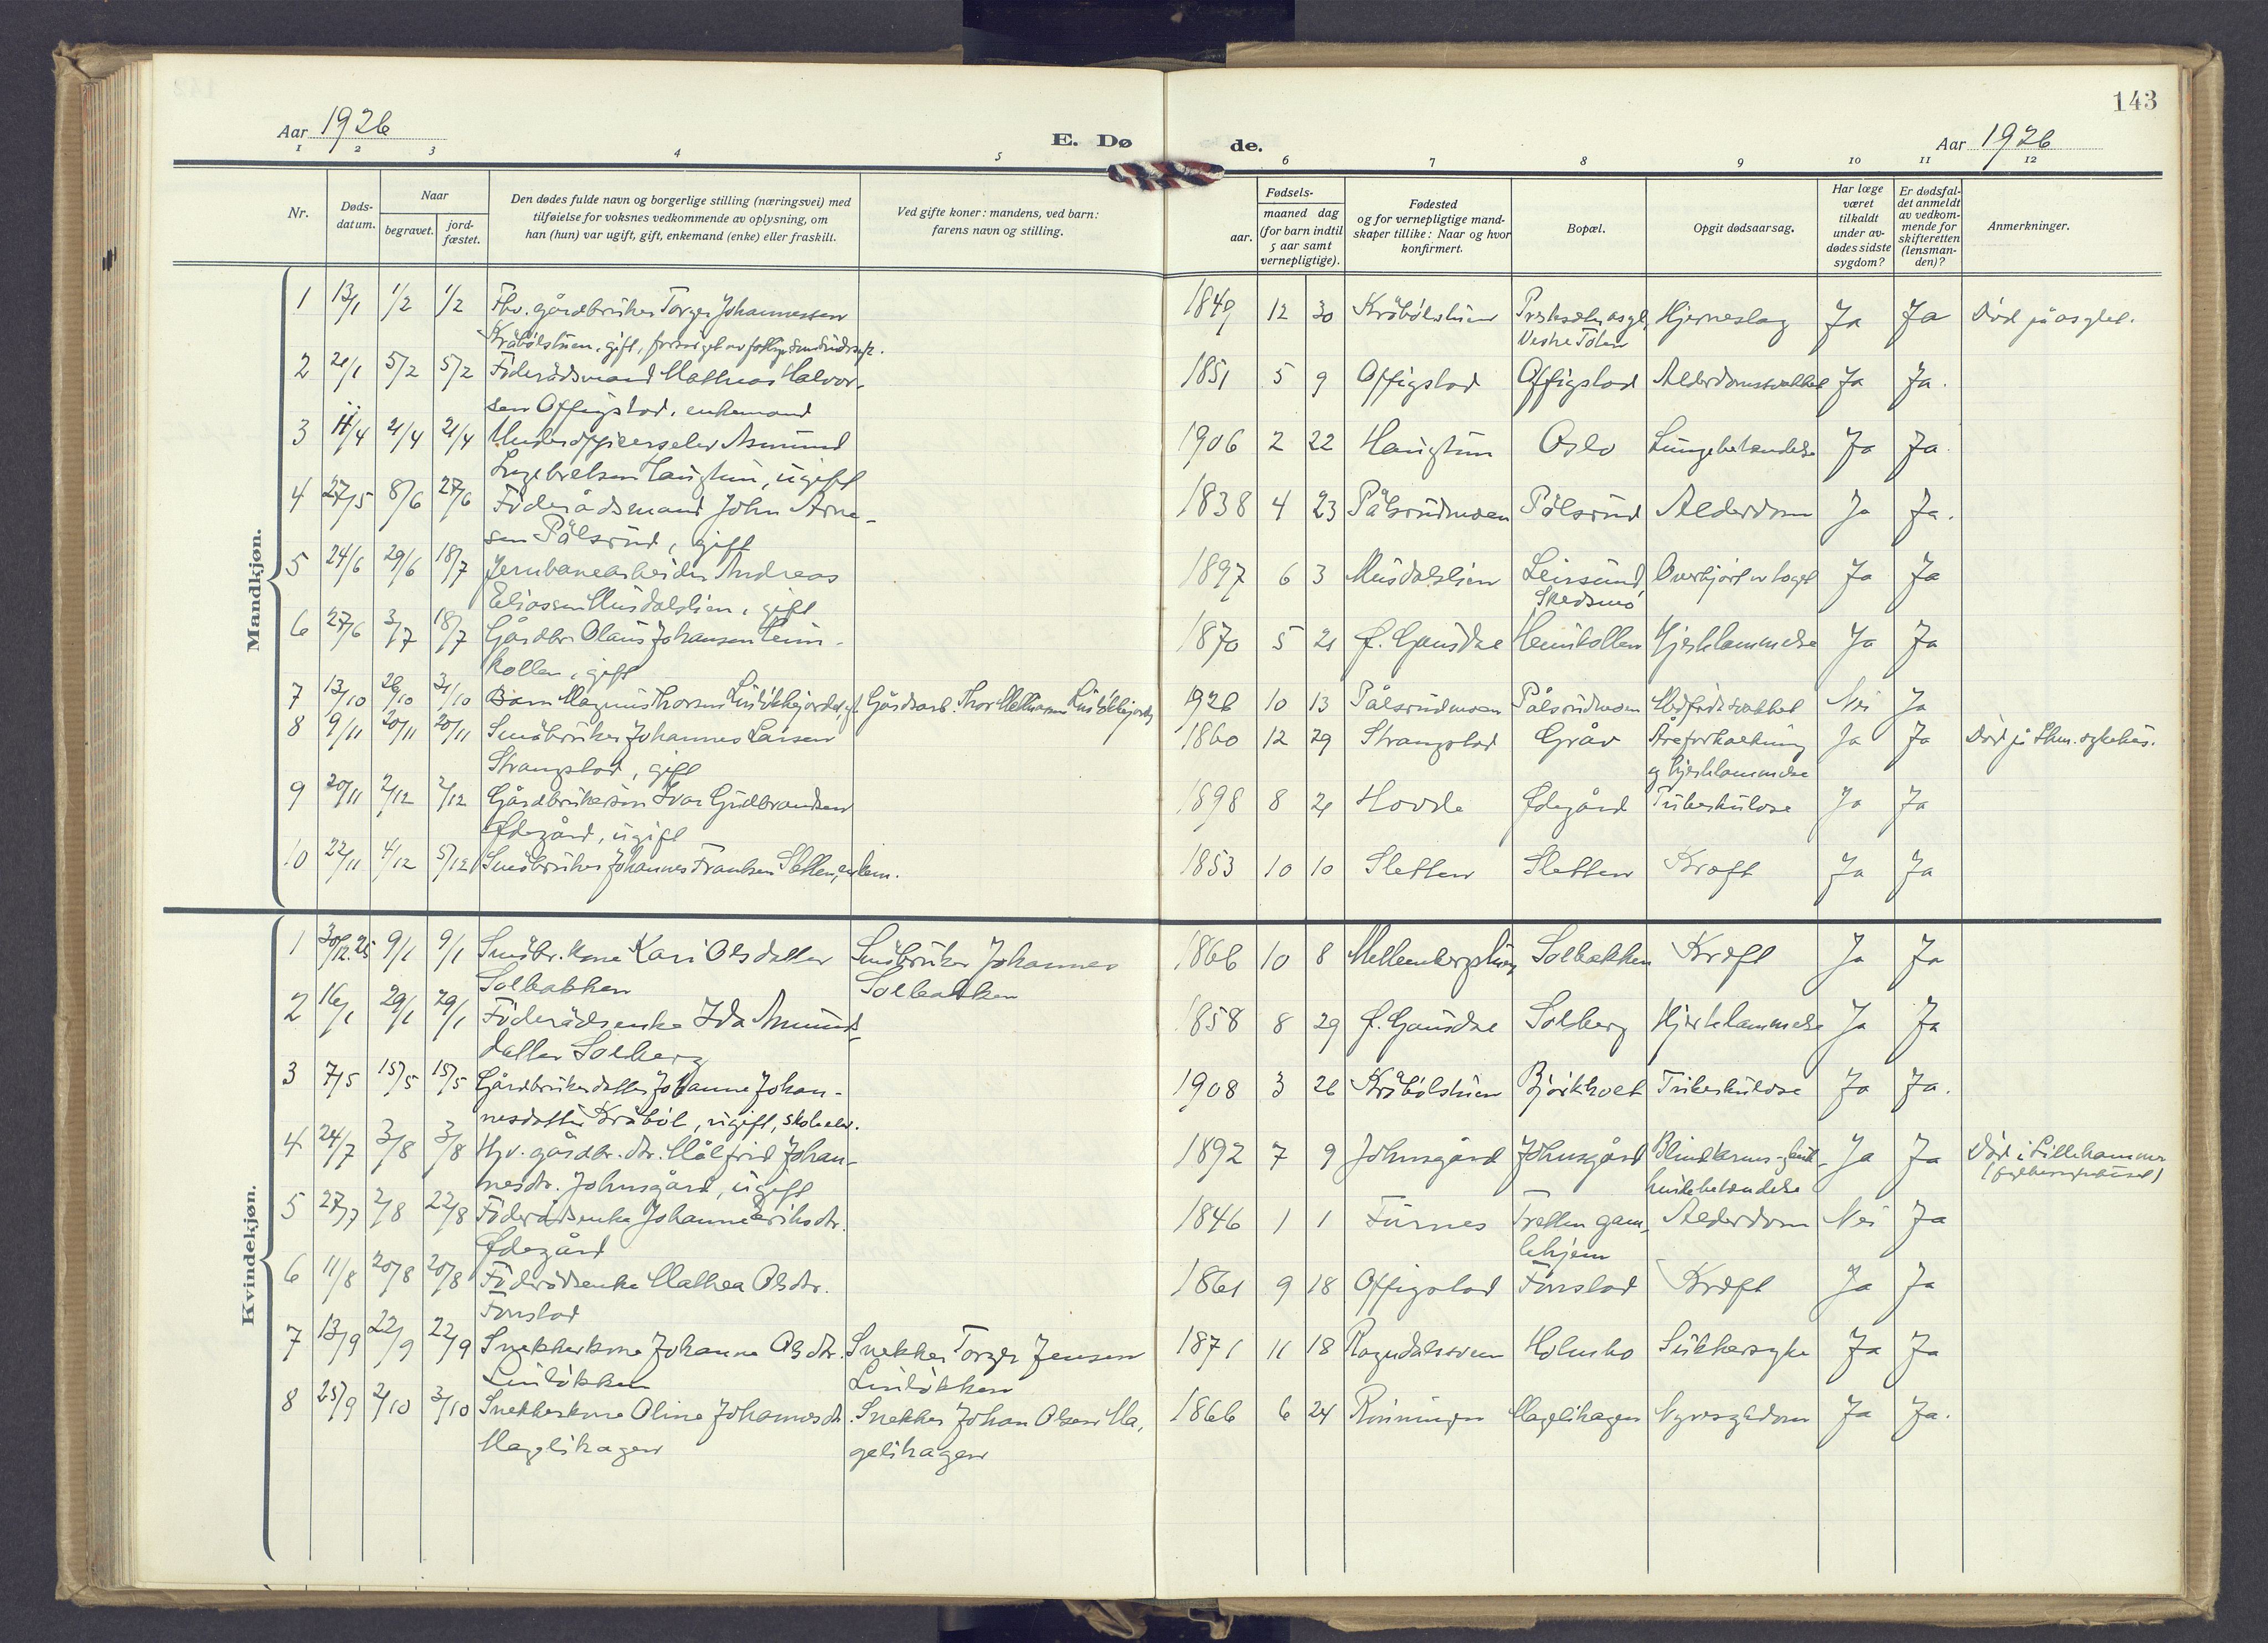 SAH, Øyer prestekontor, Ministerialbok nr. 14, 1919-1932, s. 143